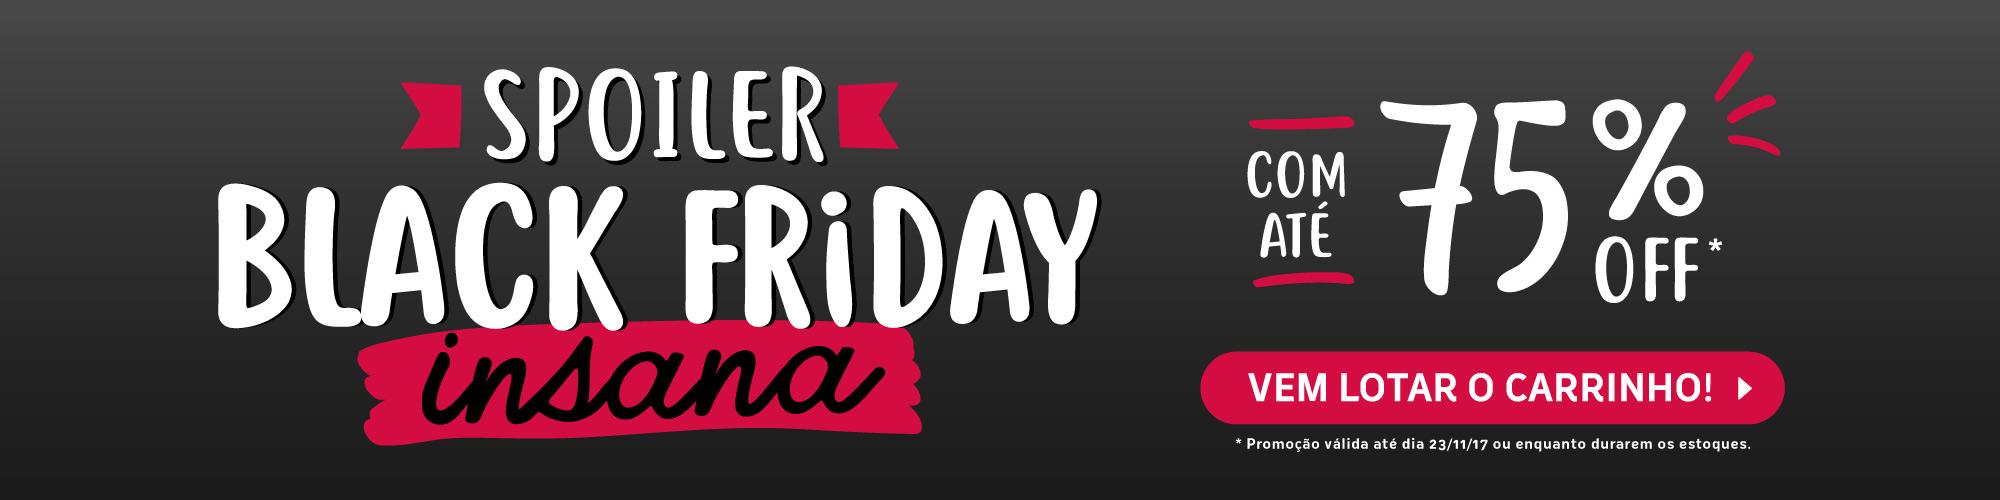 A - Esquenta Black Friday